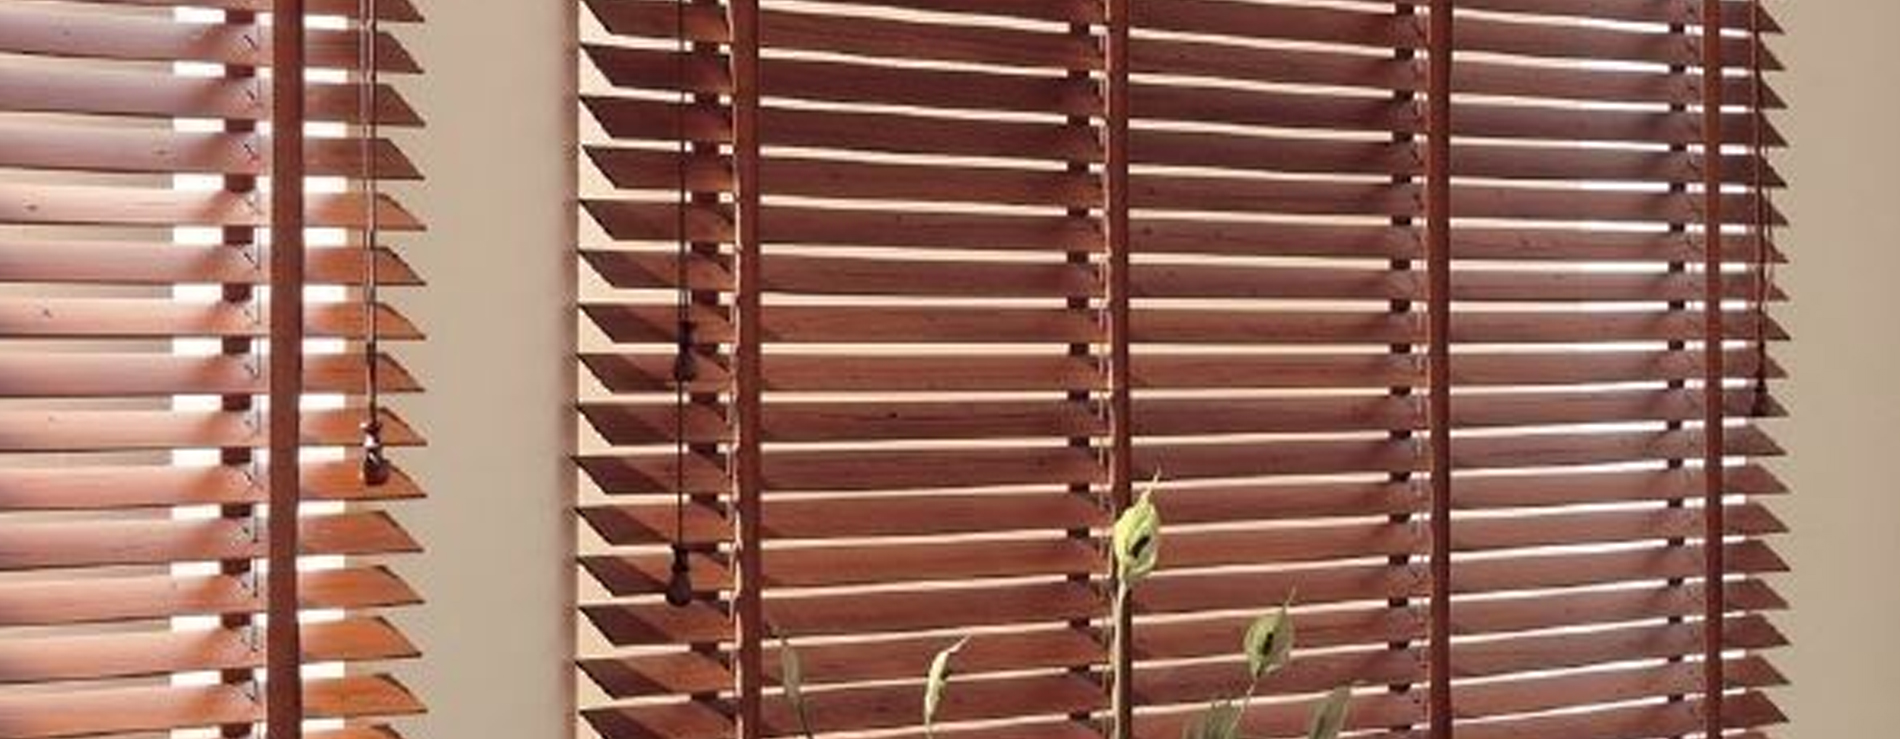 Tende veneziane tende da esterni centro mobili for Veneziane in legno ikea